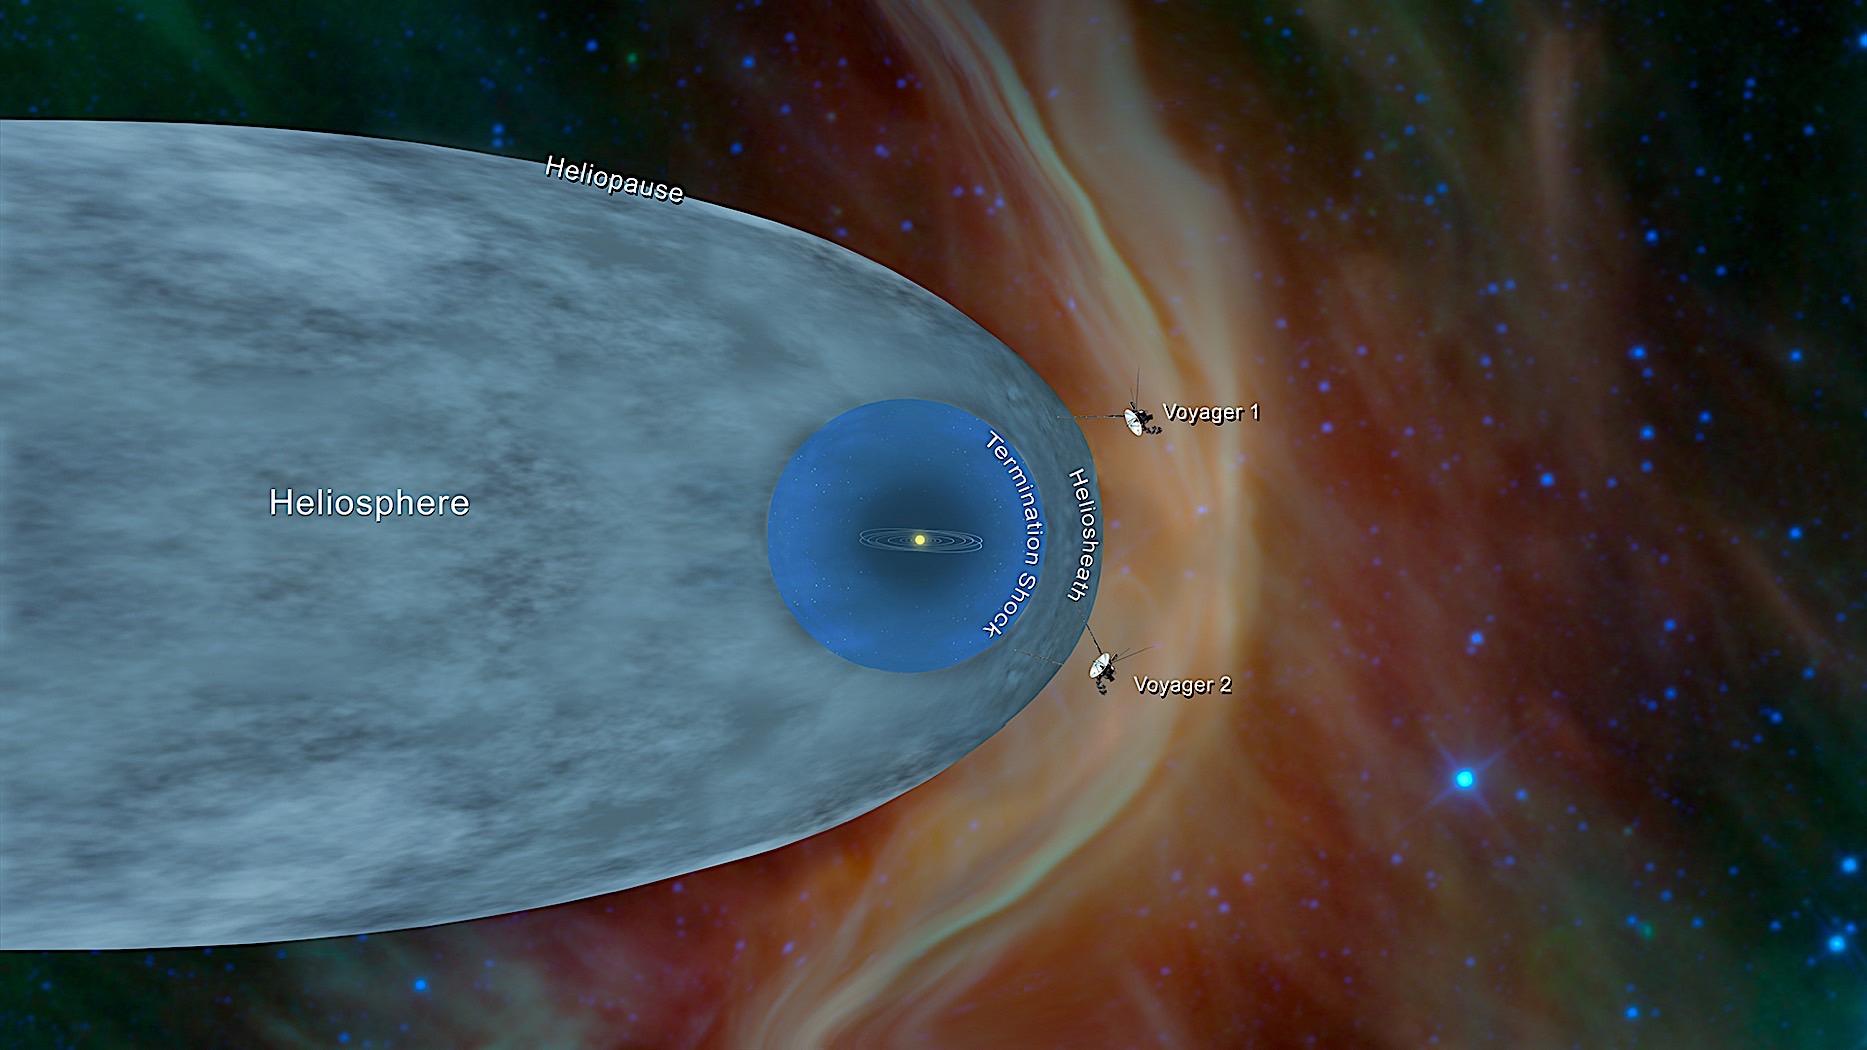 Voyager 2 ušao u međuzvezdani prostor